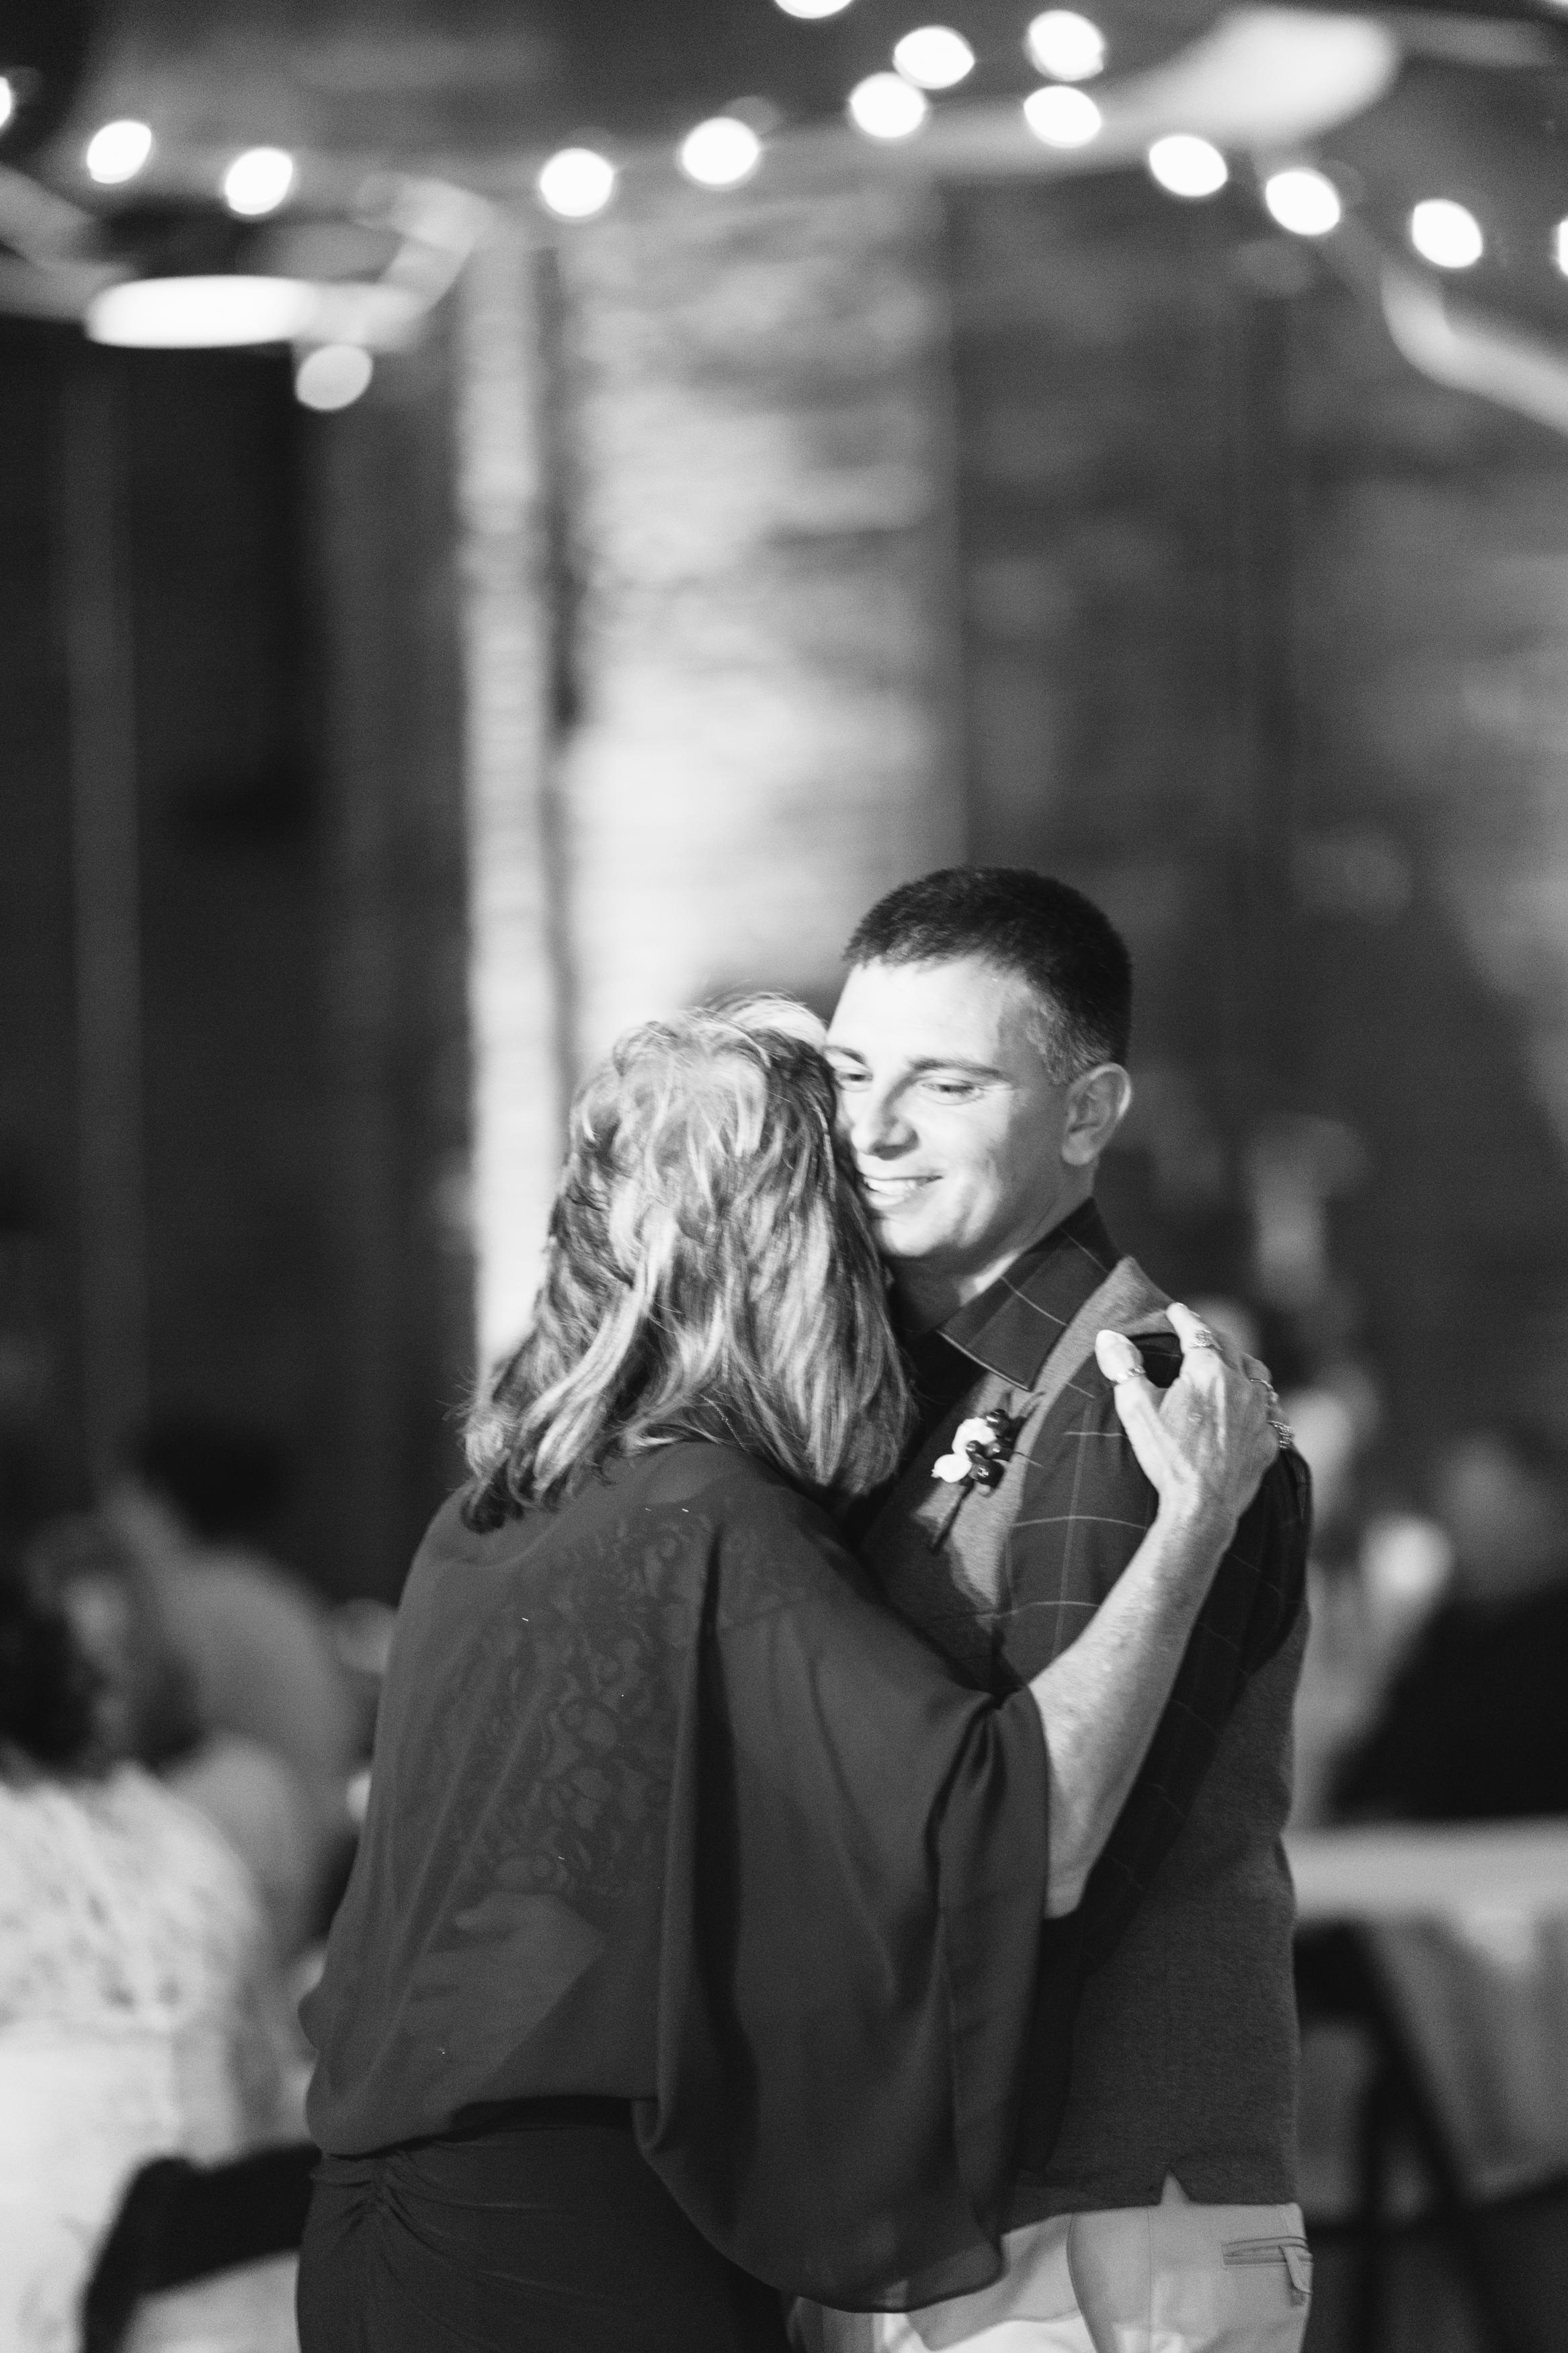 Lauren_Jeremy_Standard_Wedding_Knoxville_Abigail_Malone_Photography_FIlm-551-2.jpg